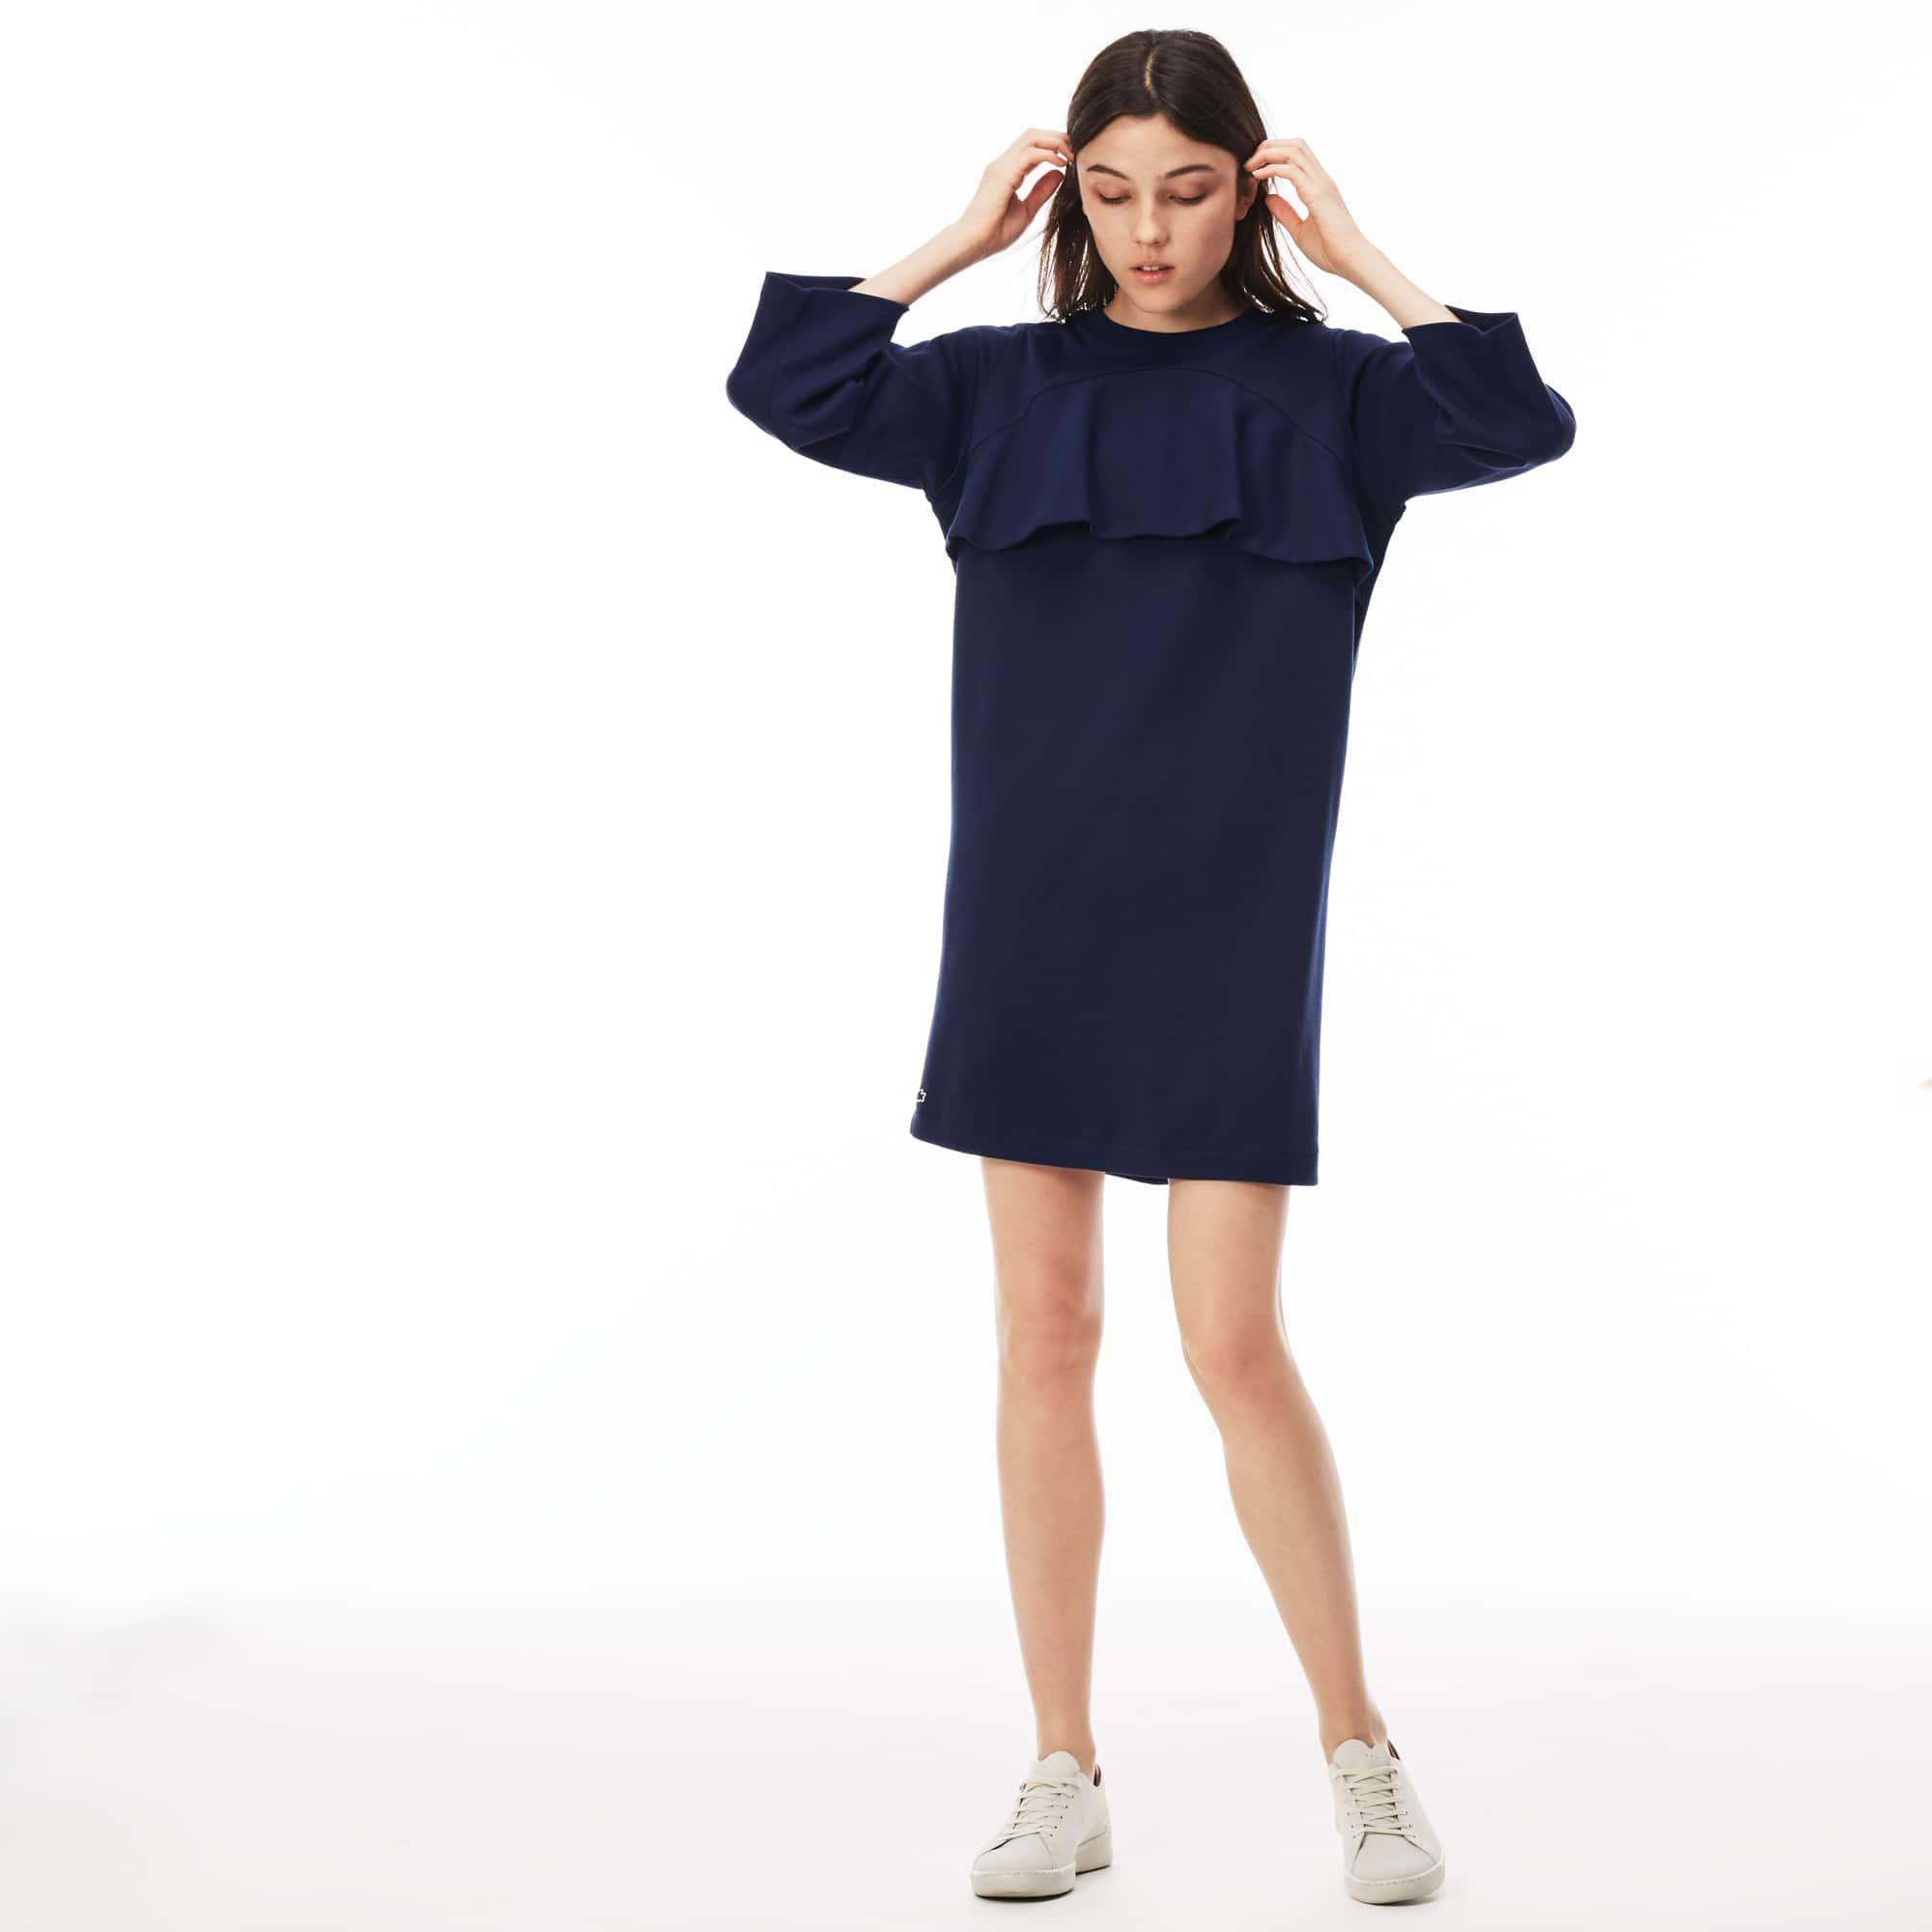 Vestido sweatshirt Lacoste LIVE em interlock unicolor com folho